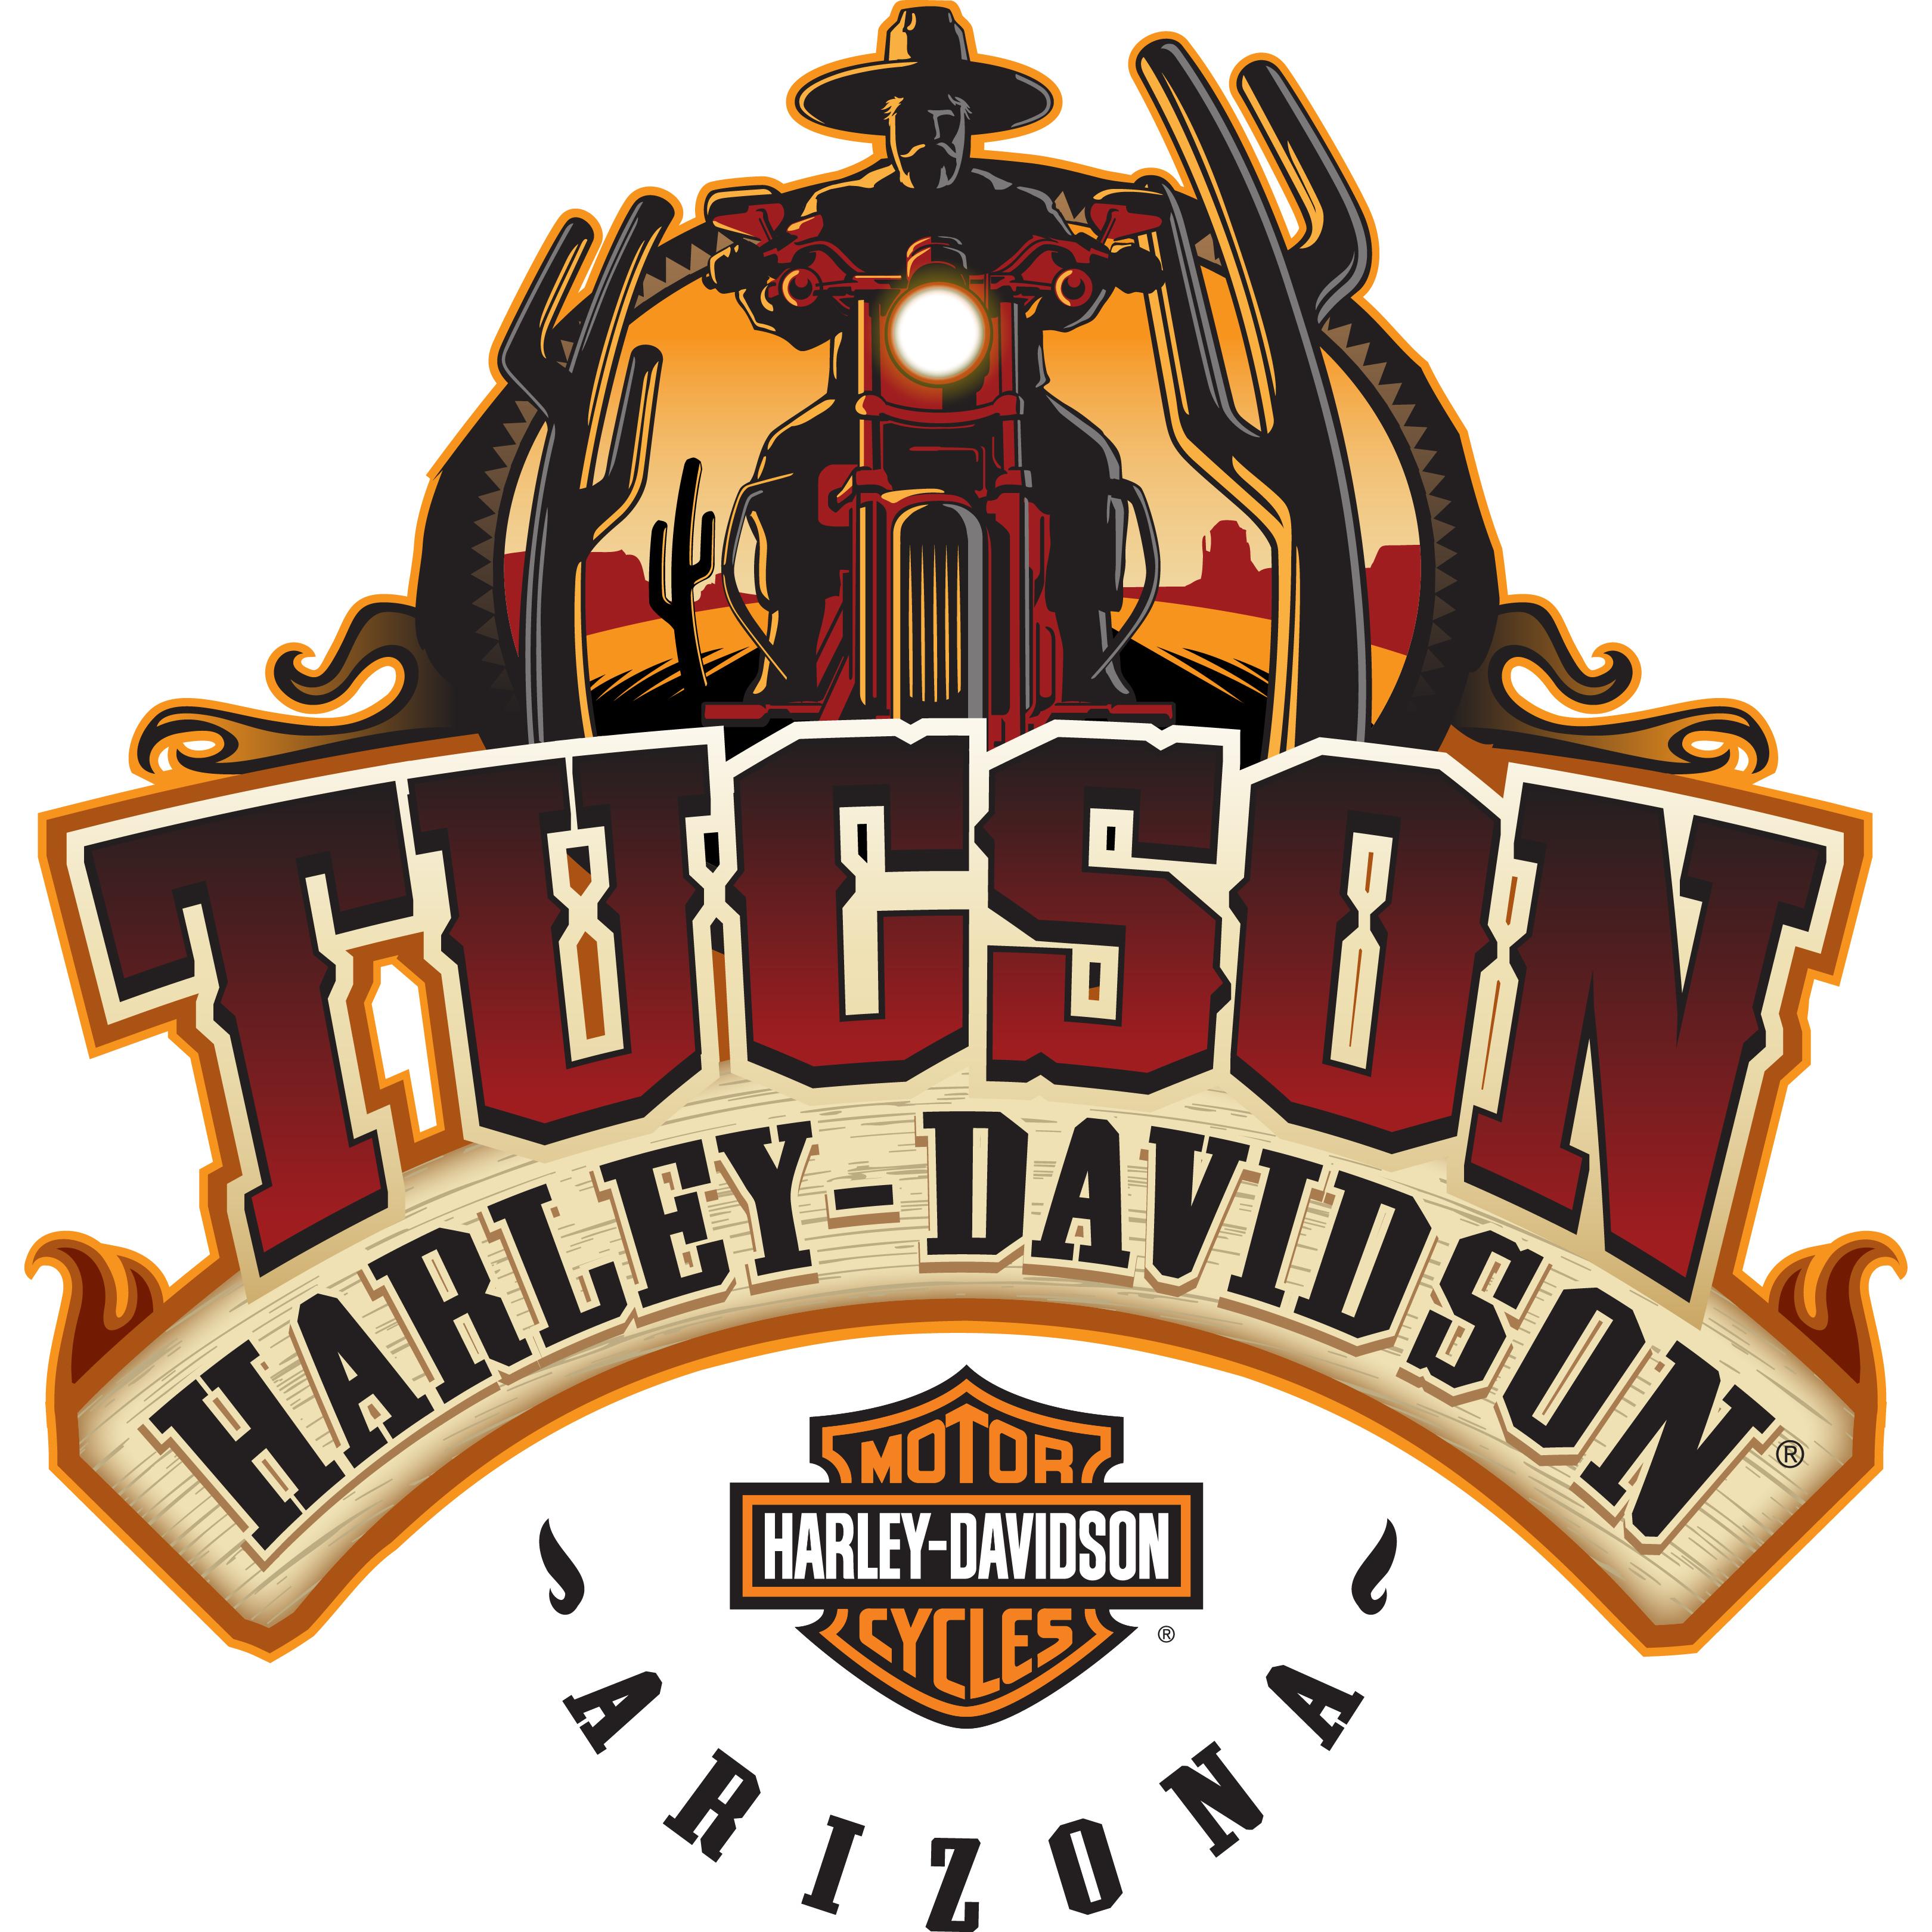 Harley-Davidson of Tucson - Tucson, AZ - Motorcycles & Scooters